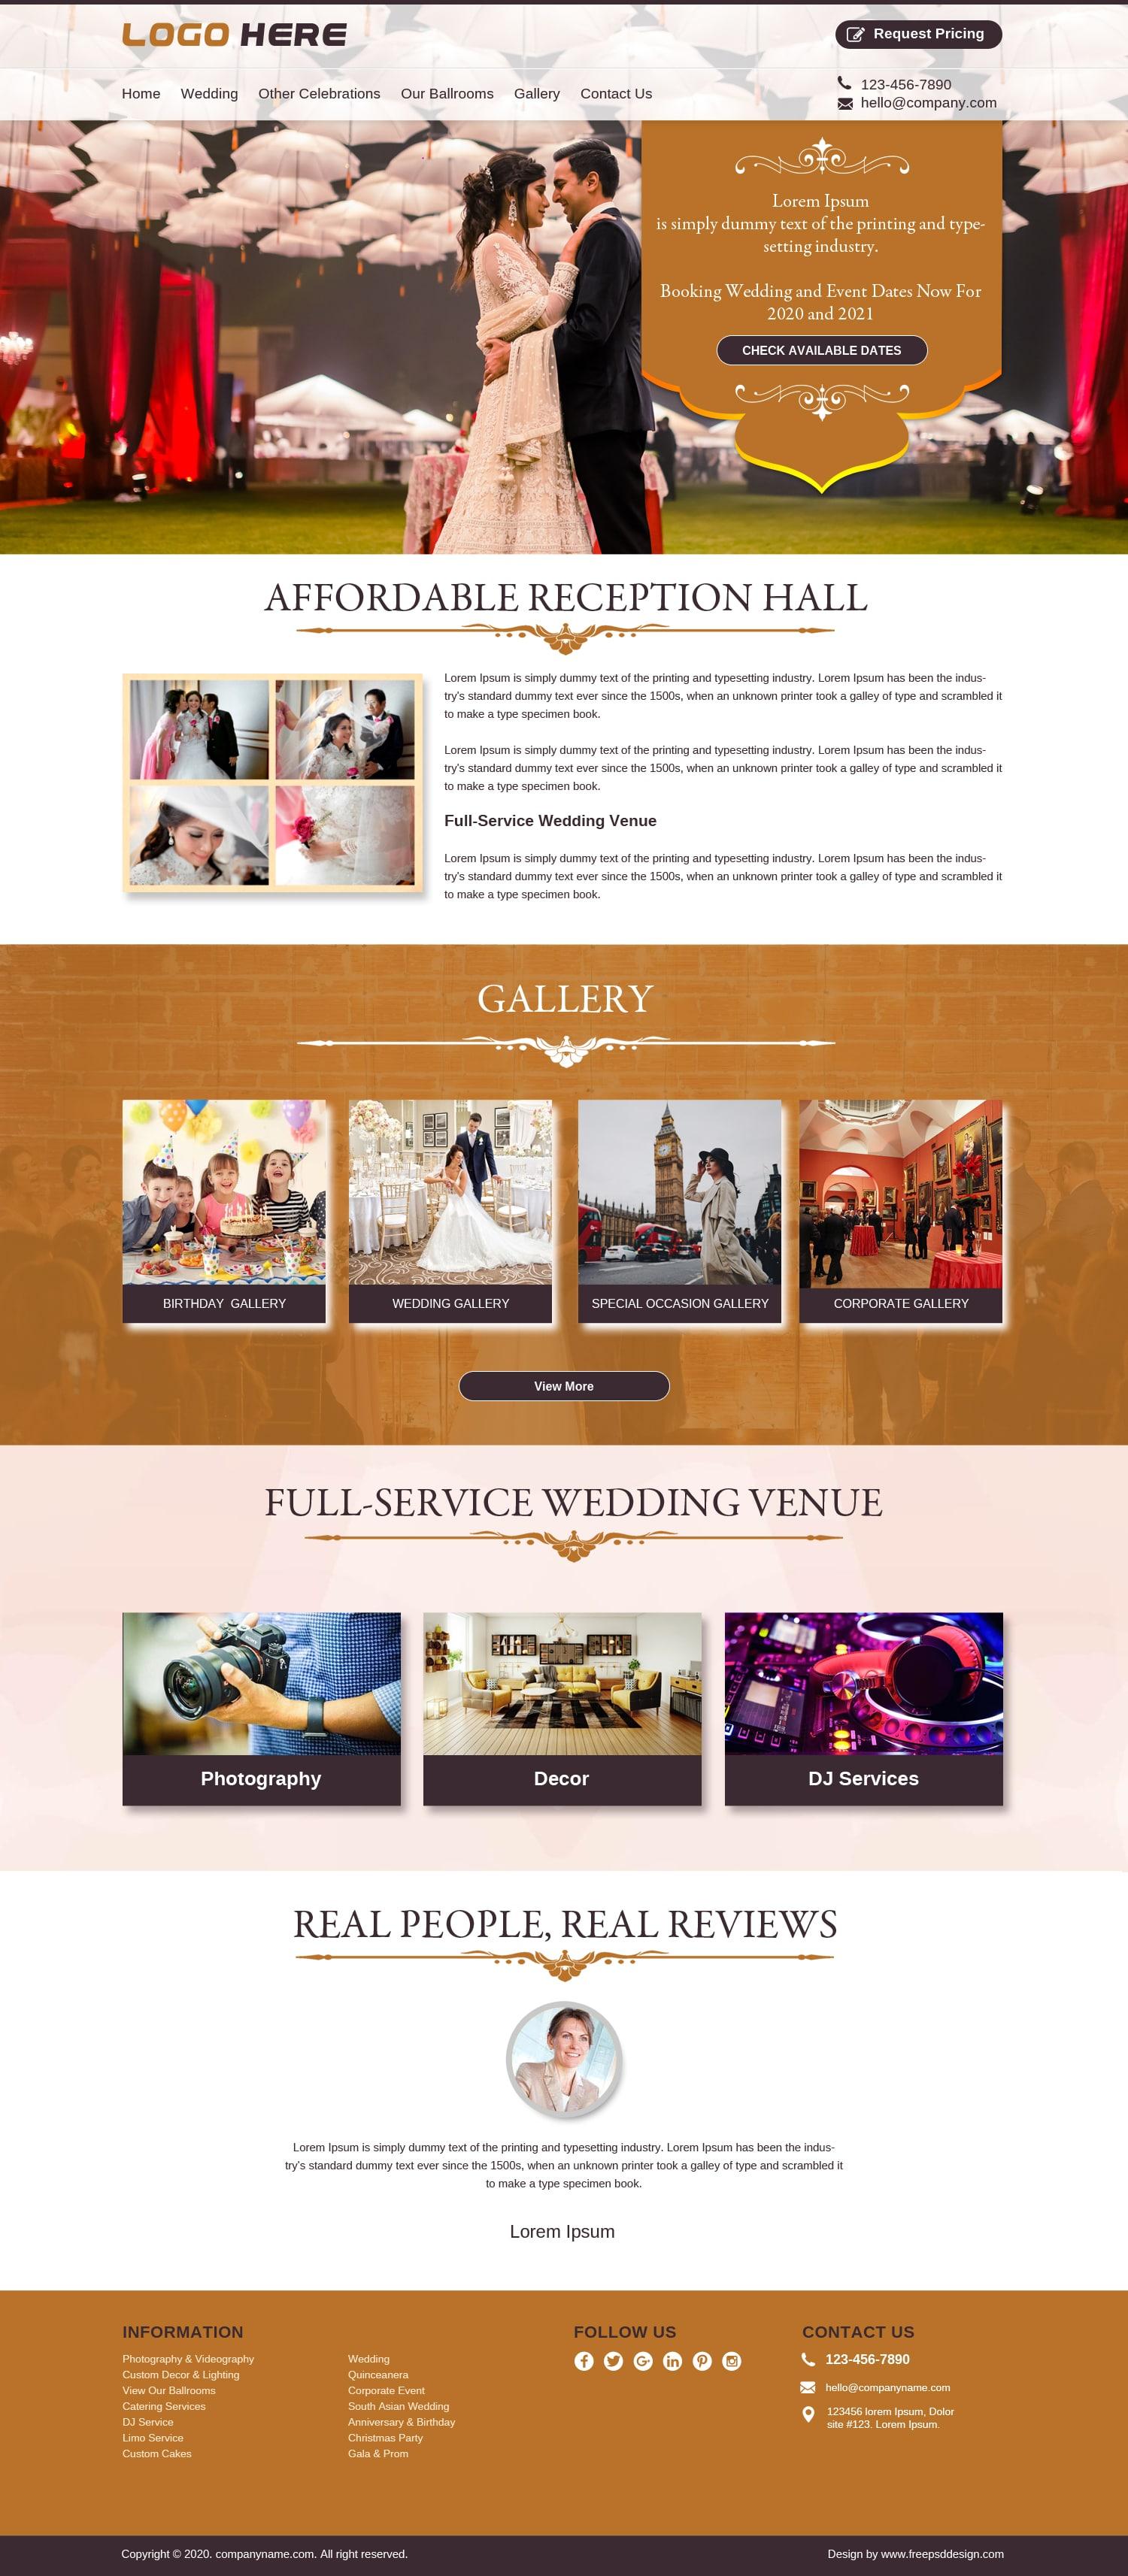 Reception venue planners & event organizer website template